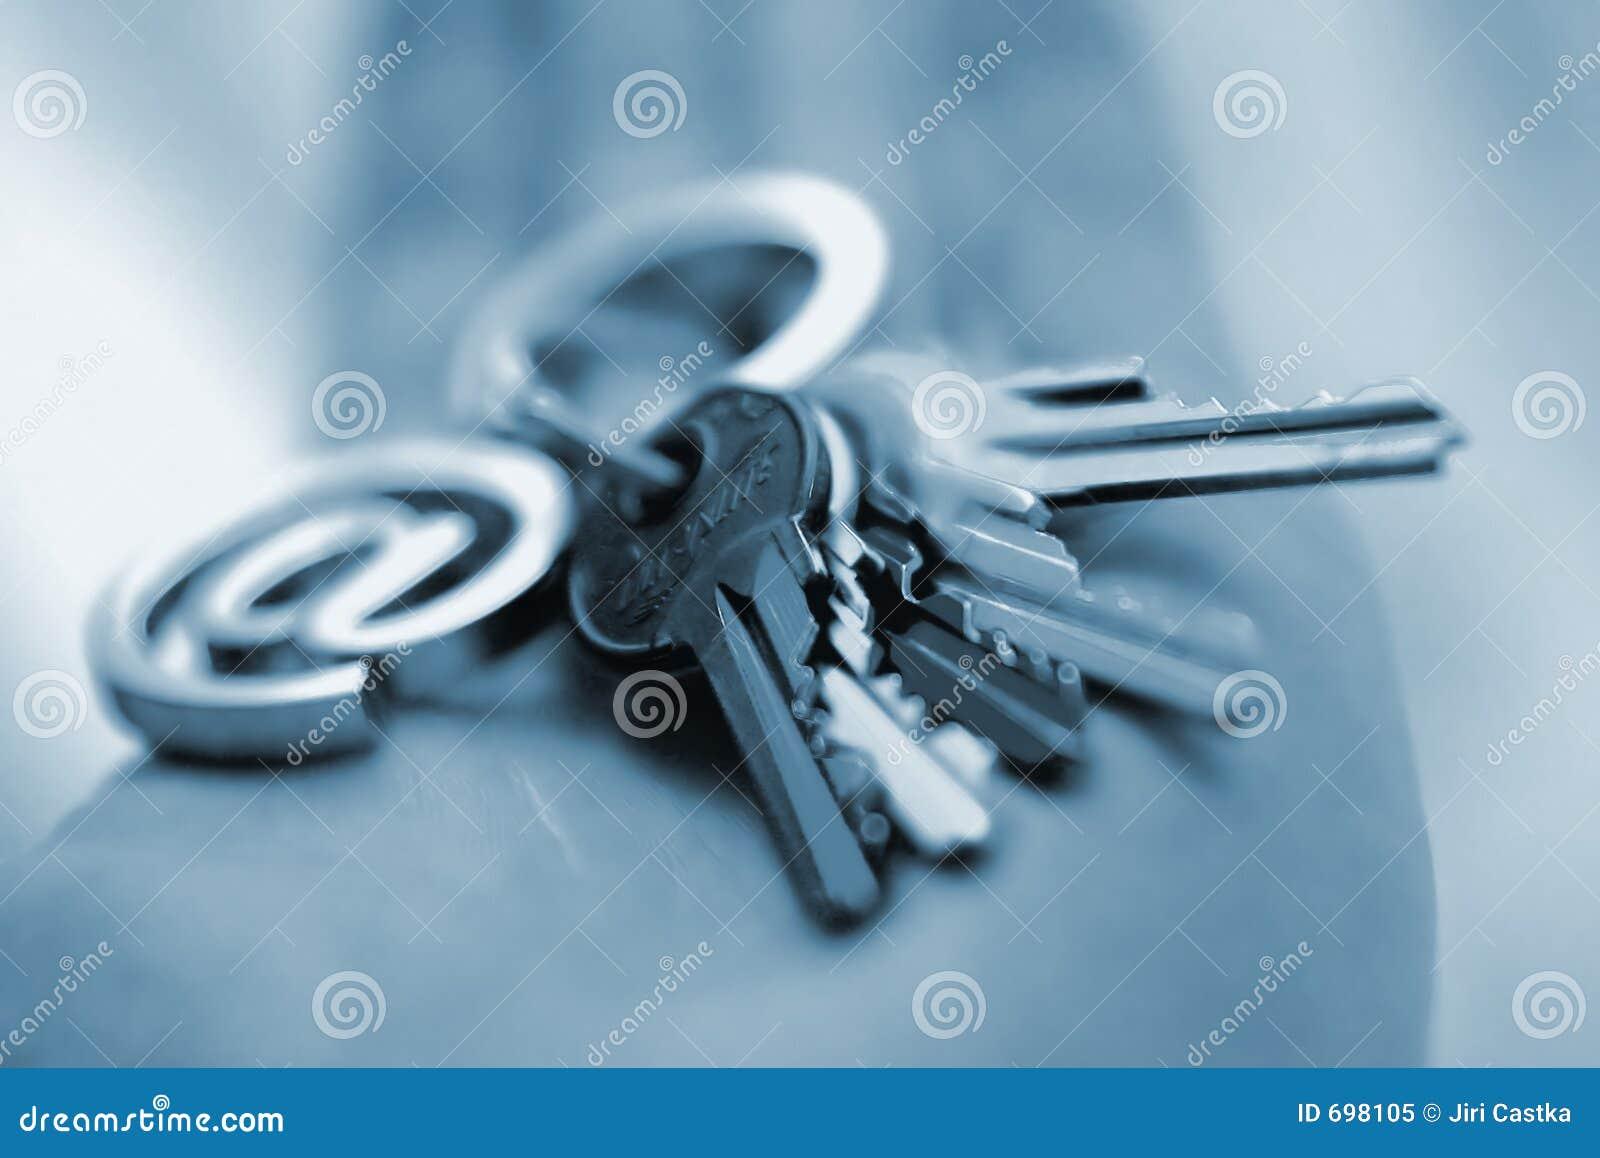 Internet keys